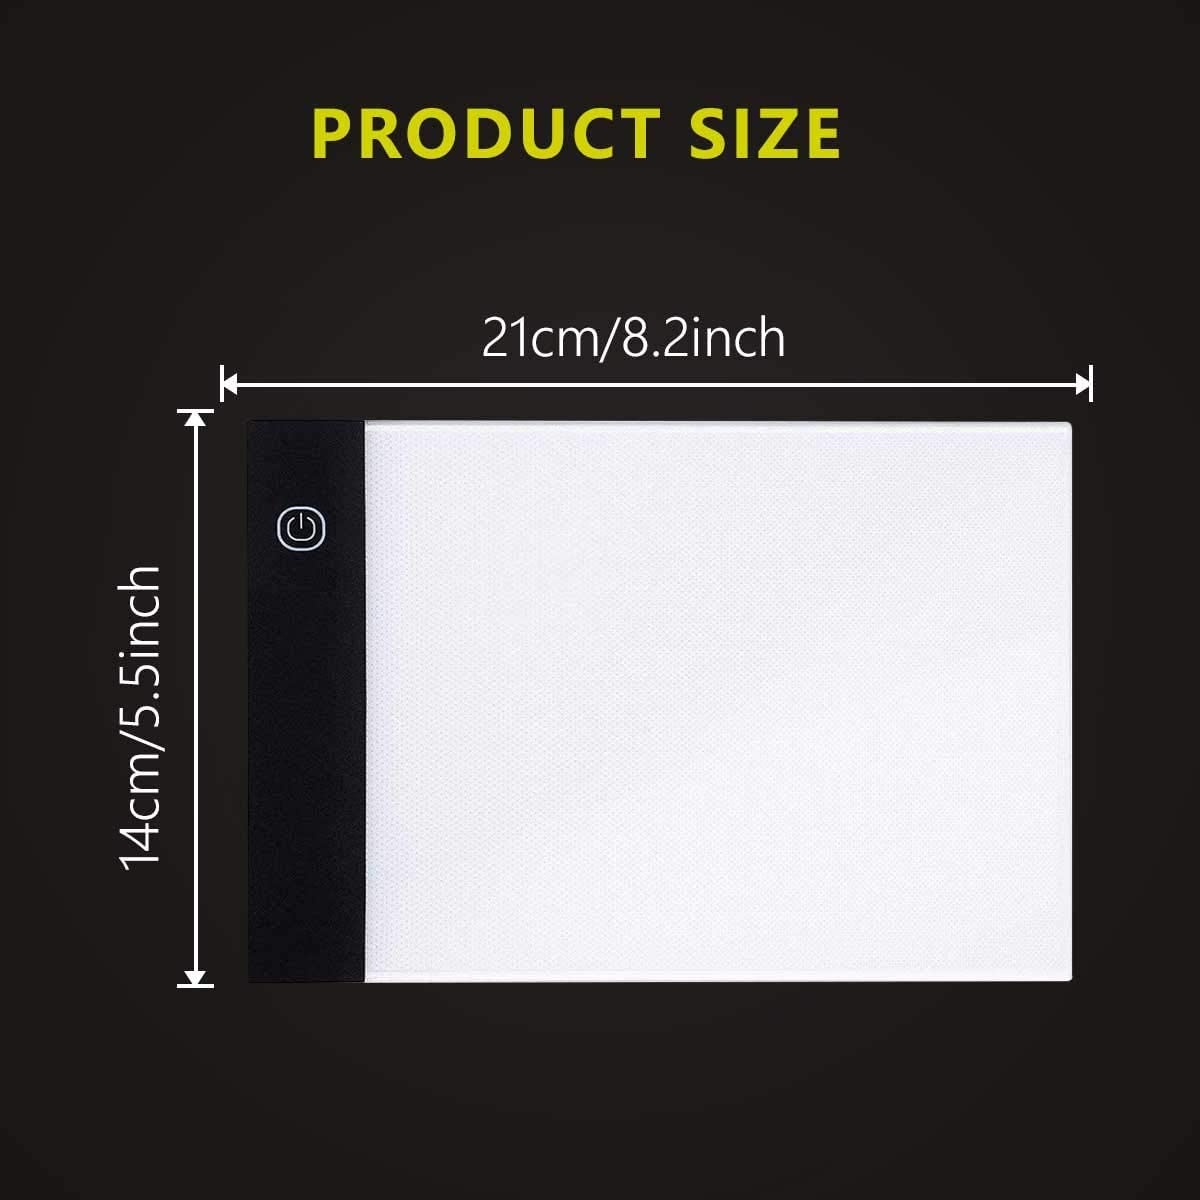 Apply to Flip Book Kit Cartoon Flipbook Creation USB Powered Light Box Dimmable Brightness Light Board Ligtek Mini LED Light Pad for Animation